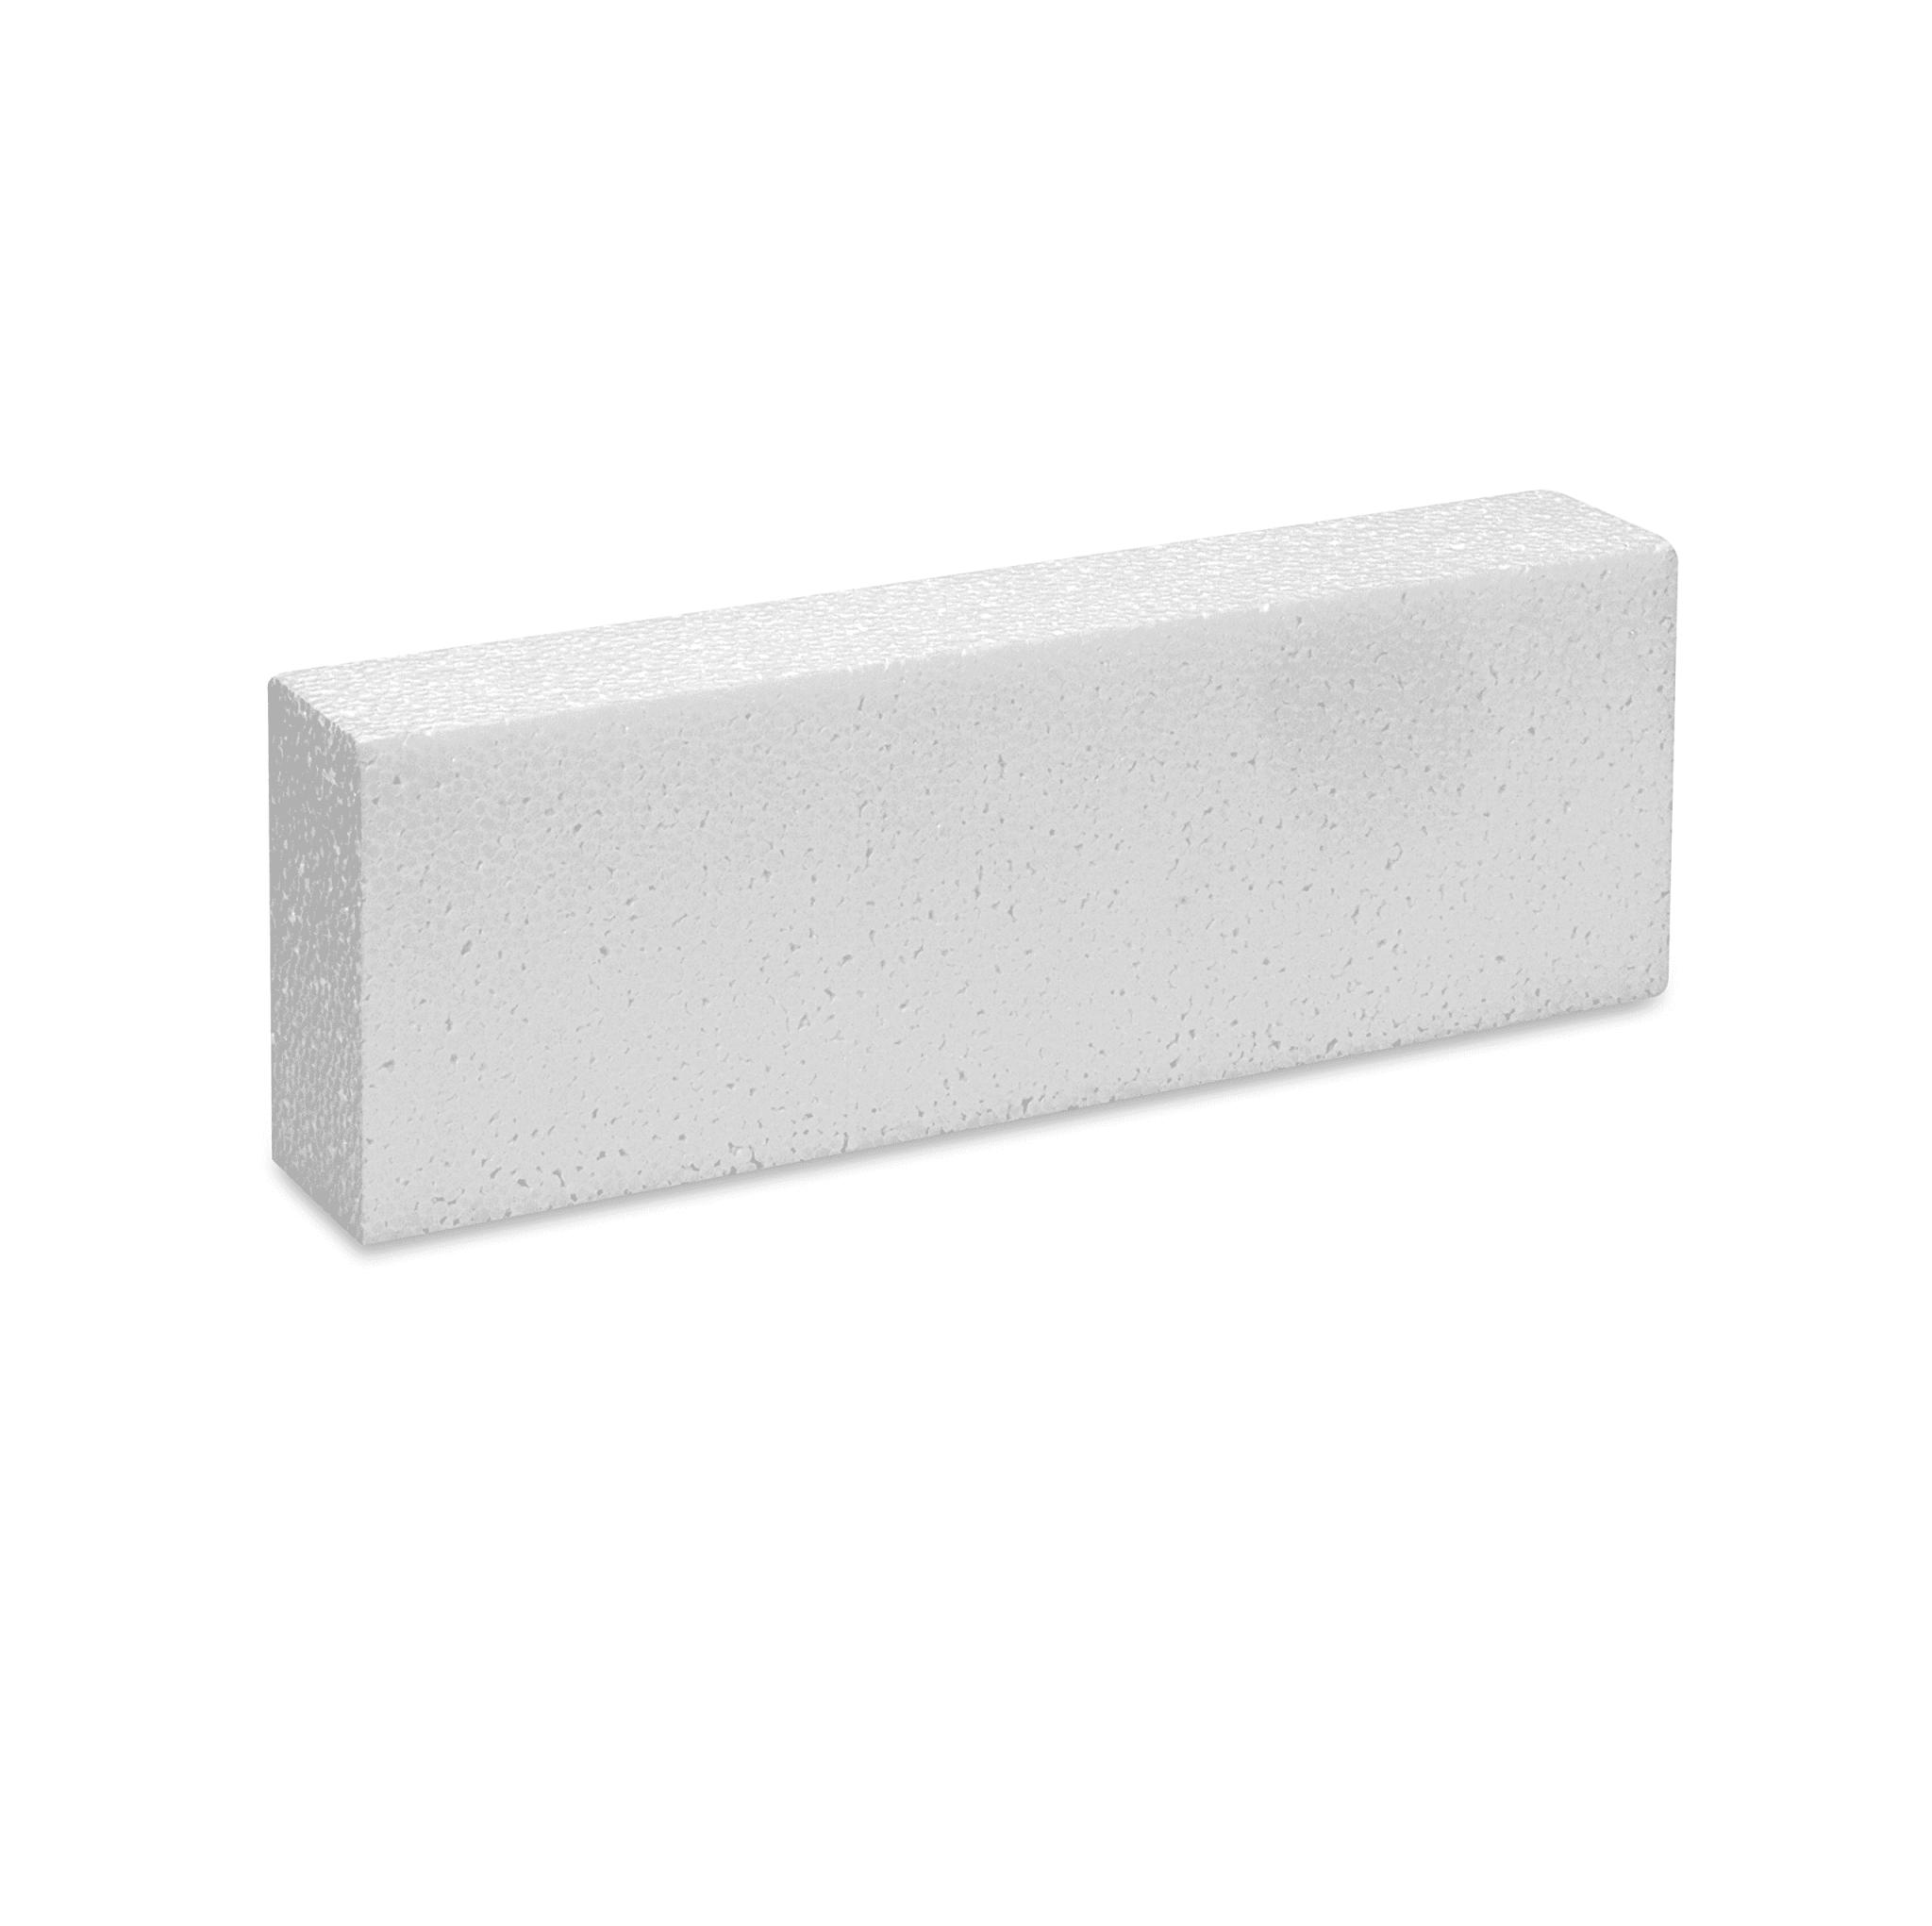 "White Bead Foam Block 2''x4""x12"""